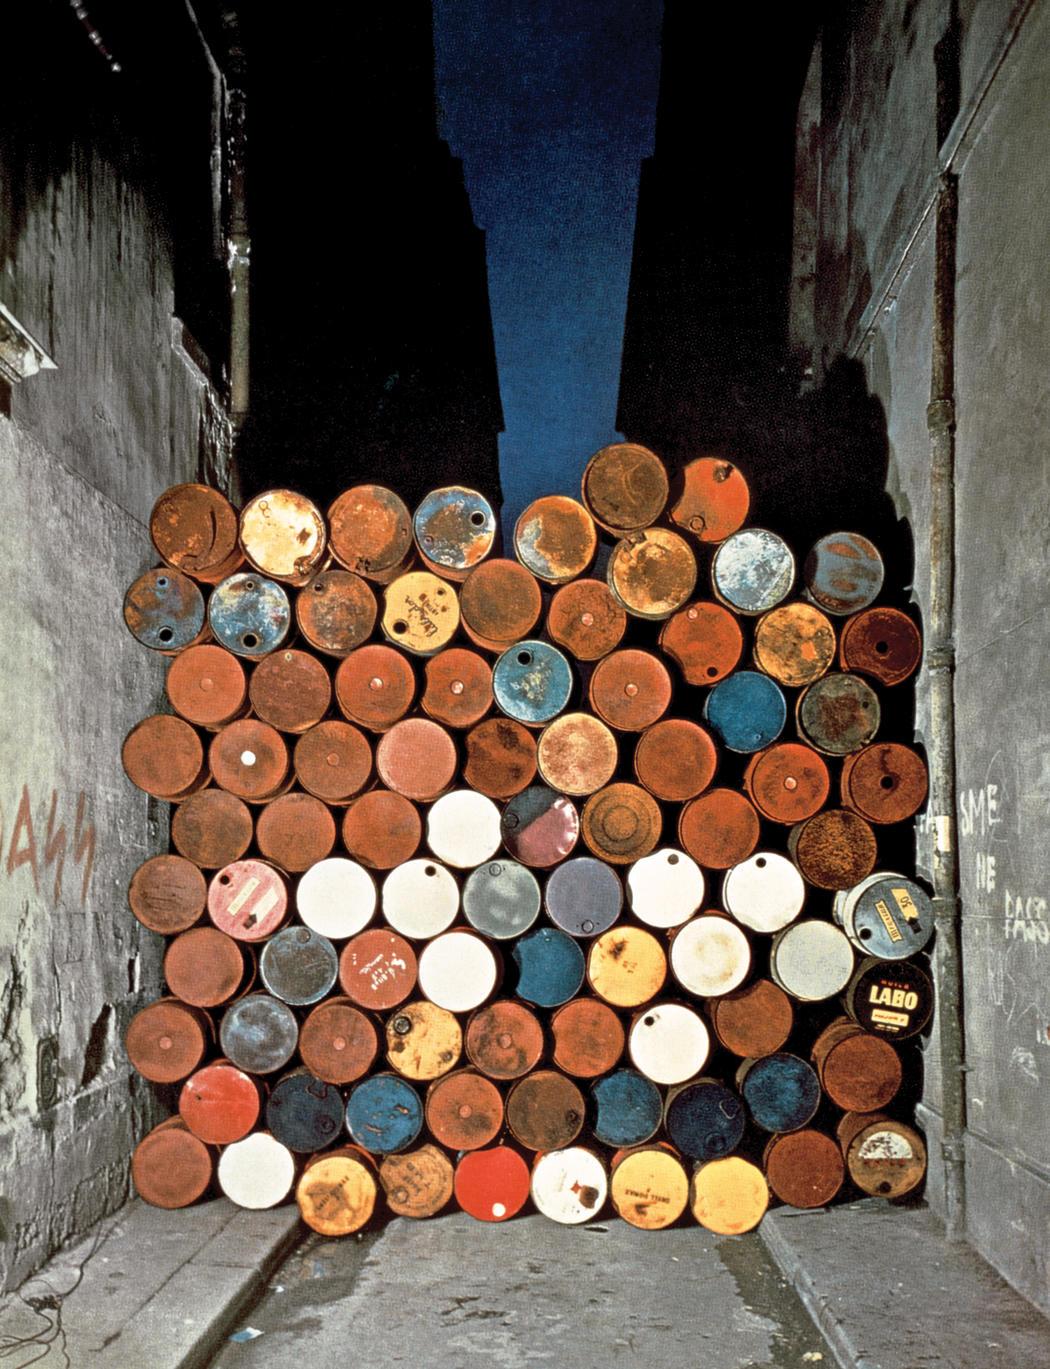 Christo and Jeanne-Claude  Wall of Oil Barrels - The Iron Curtain, Rue Visconti, Paris, 1961-62  Photo: Jean-Dominique Lajoux  © 1962 Christo